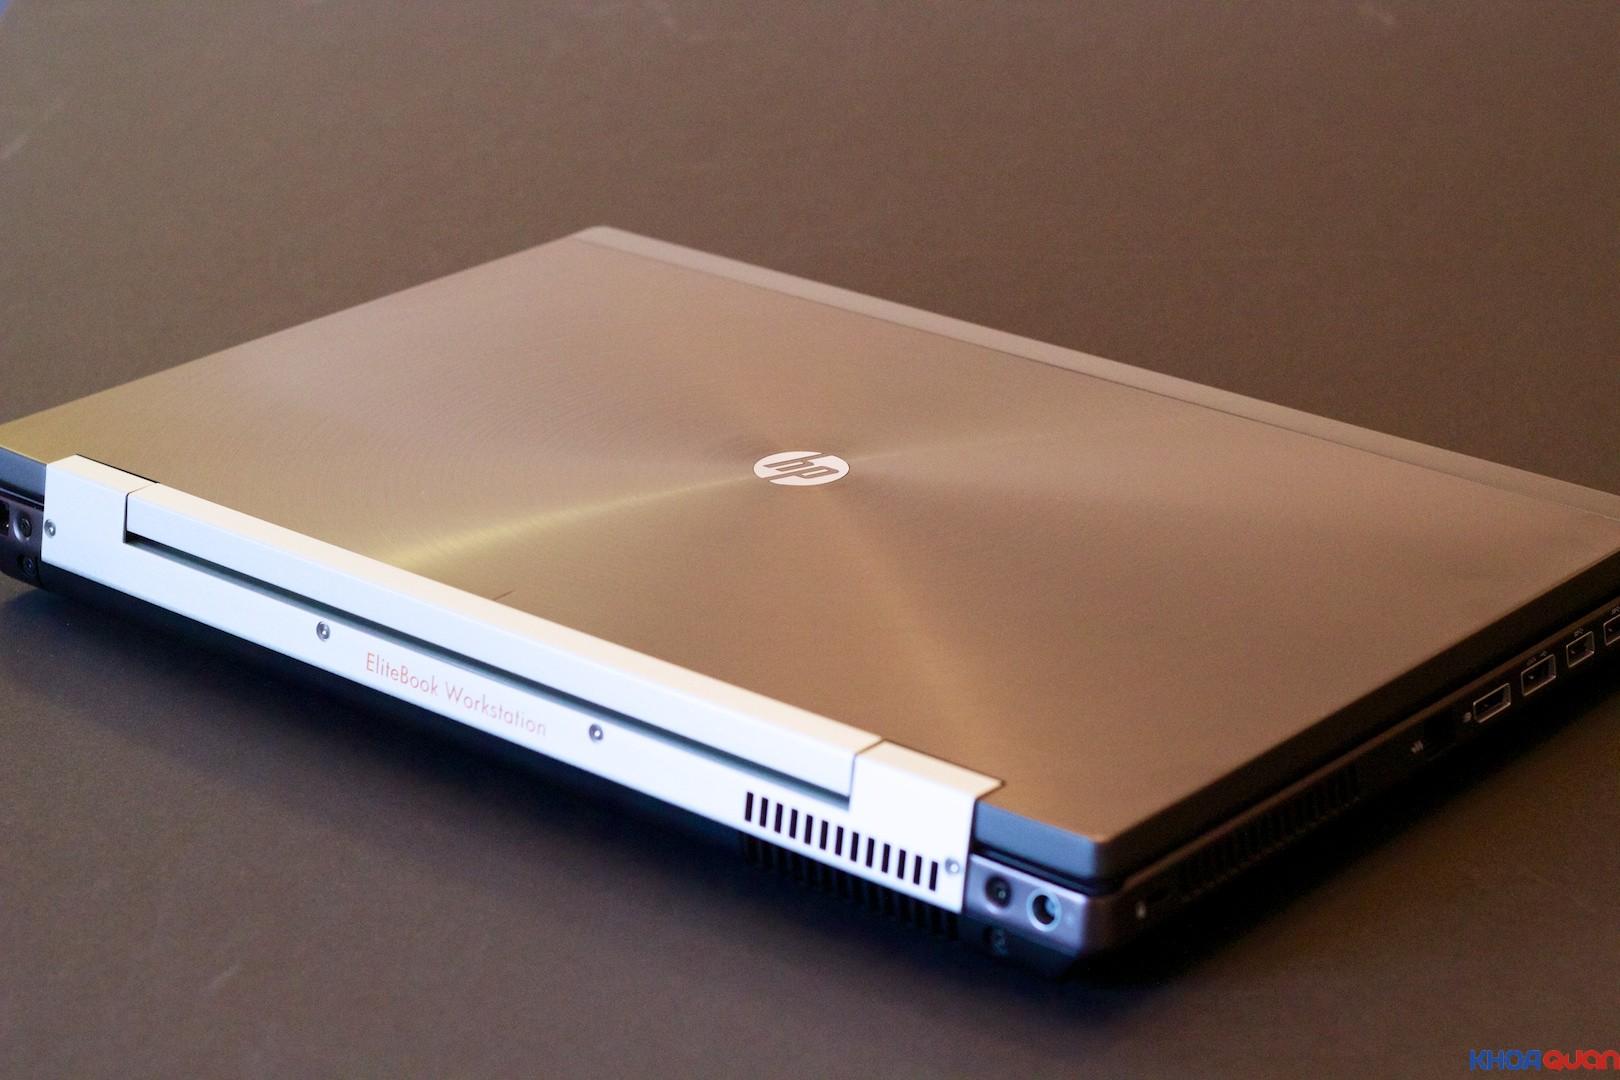 laptop-hp-workstation-8770w-chuyen-dung-cho-do-hoa